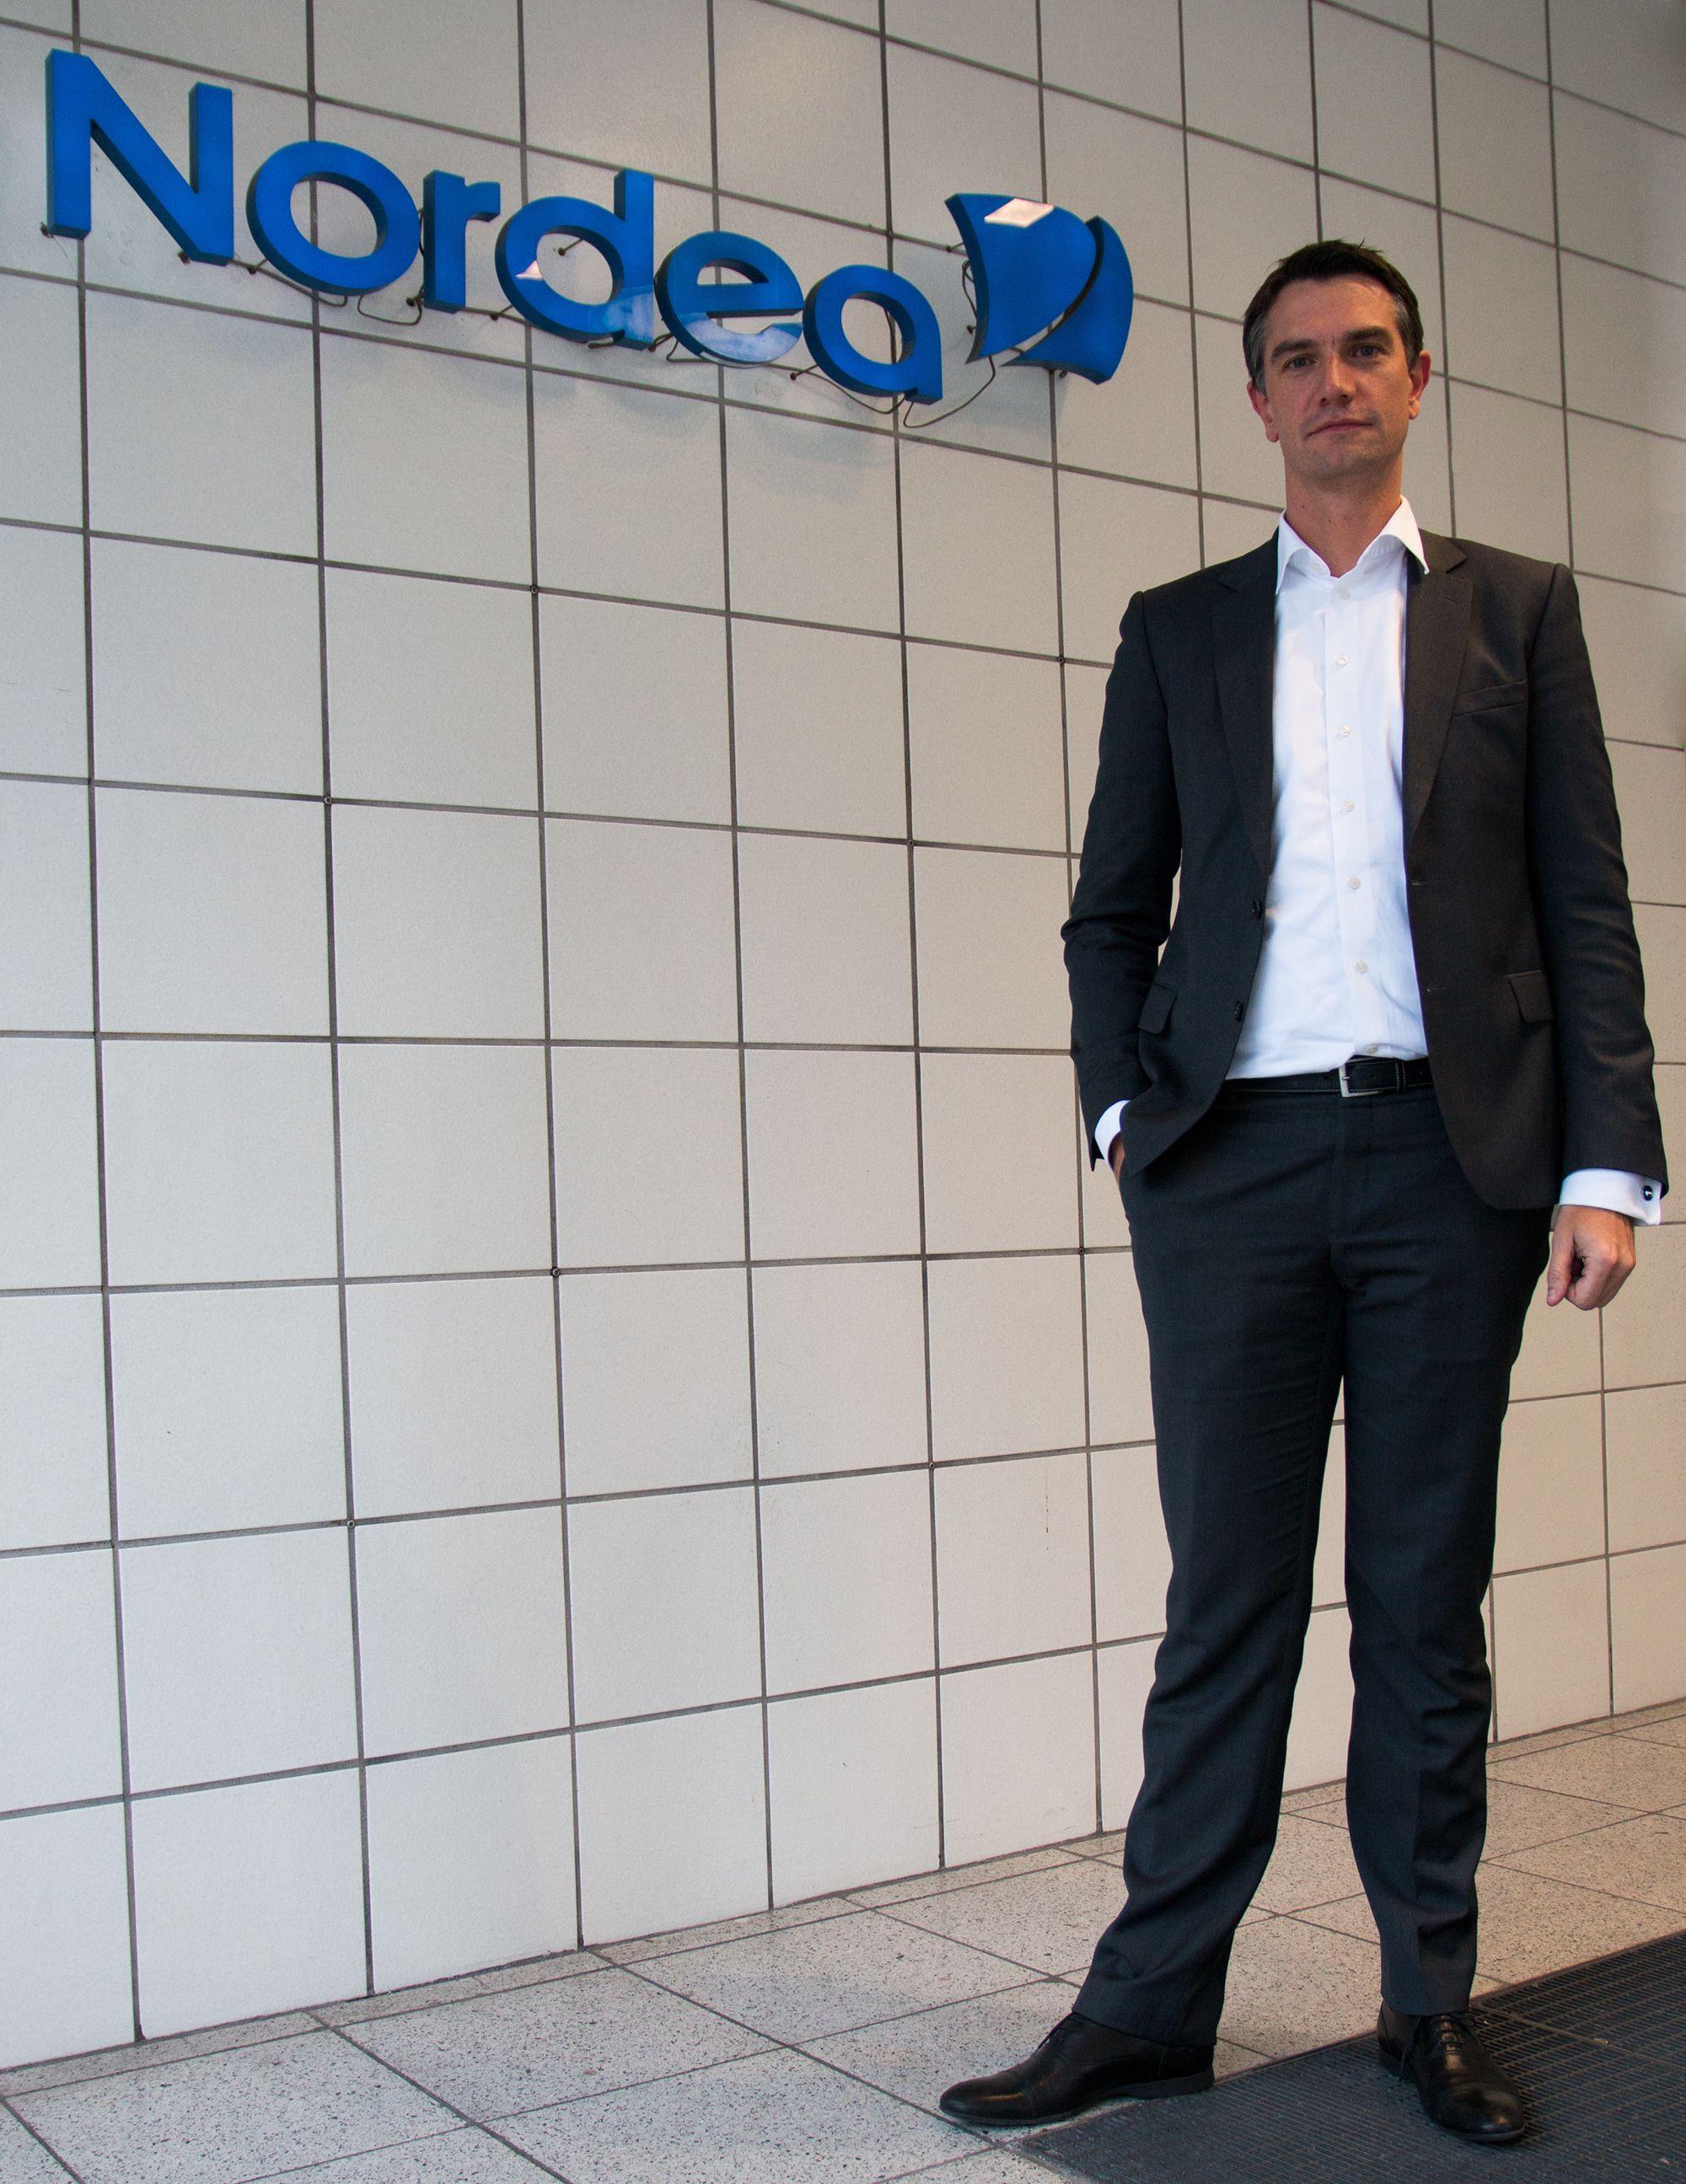 Christian Bornfeld, leder for Nordea Digital Banking.Foto: Anders Brattensborg Smedsrud, Tek.no